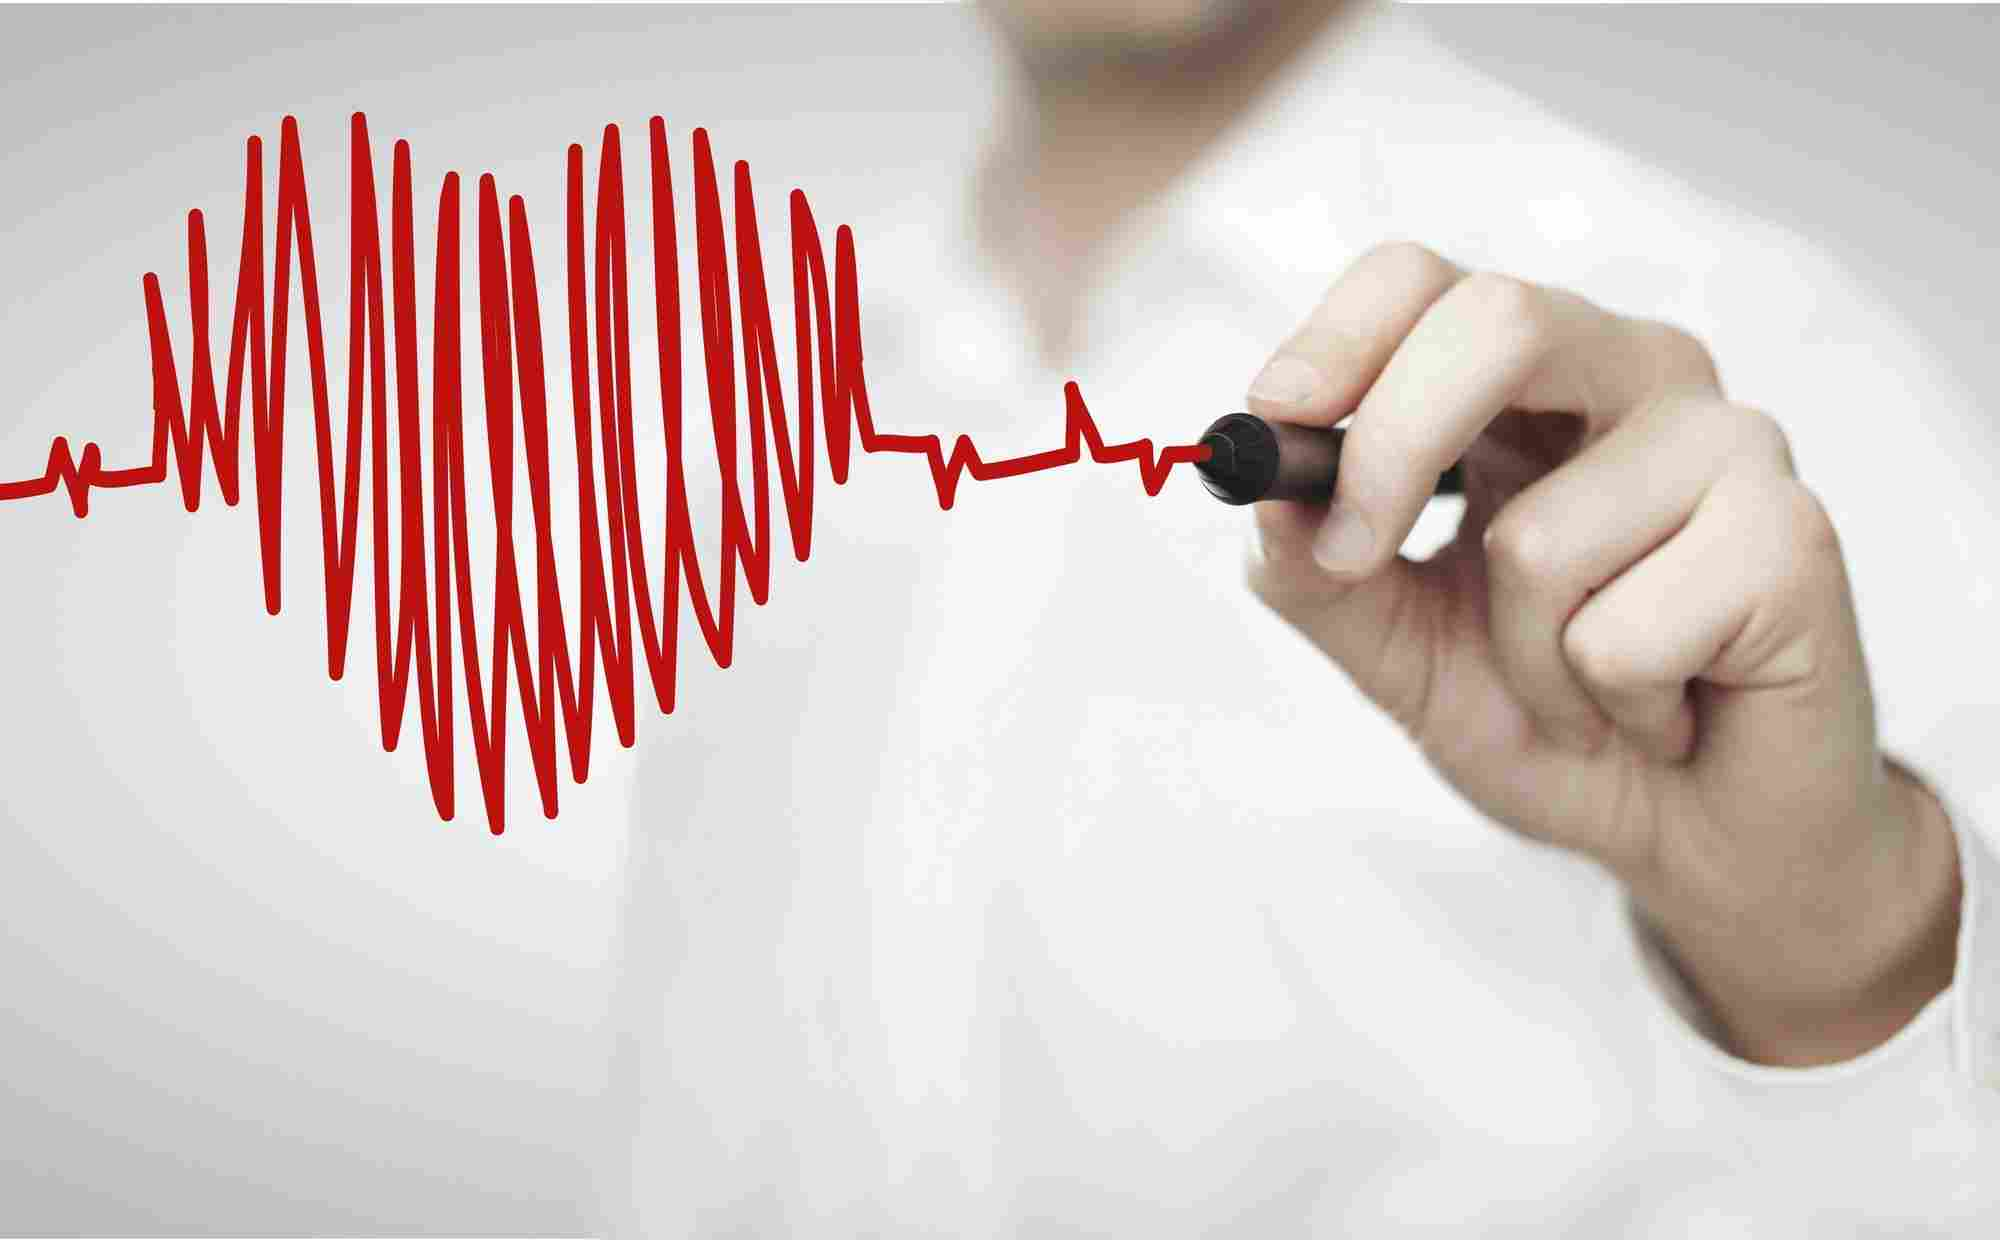 http://kinderarztpraxis-fulda.de/wp-content/uploads/2015/12/heart-health-1.jpg